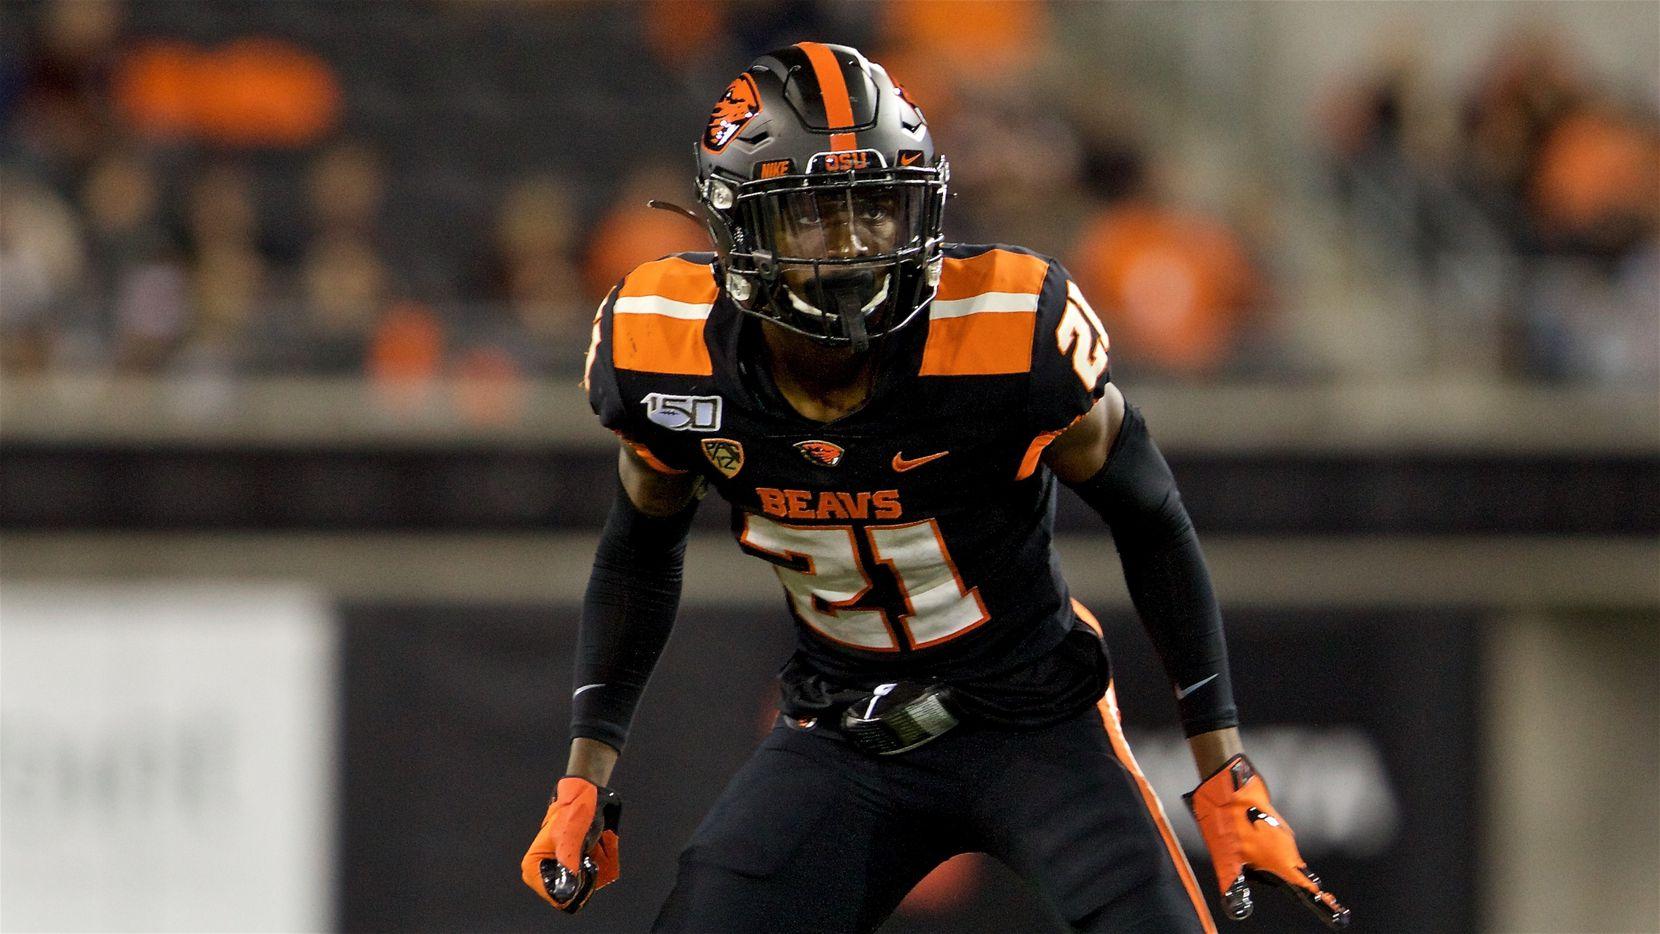 Oregon State Beavers defensive back Nahshon Wright during an NCAA football game on Friday, Aug. 30, 2019 in Corvallis, Ore. (AP Photo/Craig Mitchelldyer)